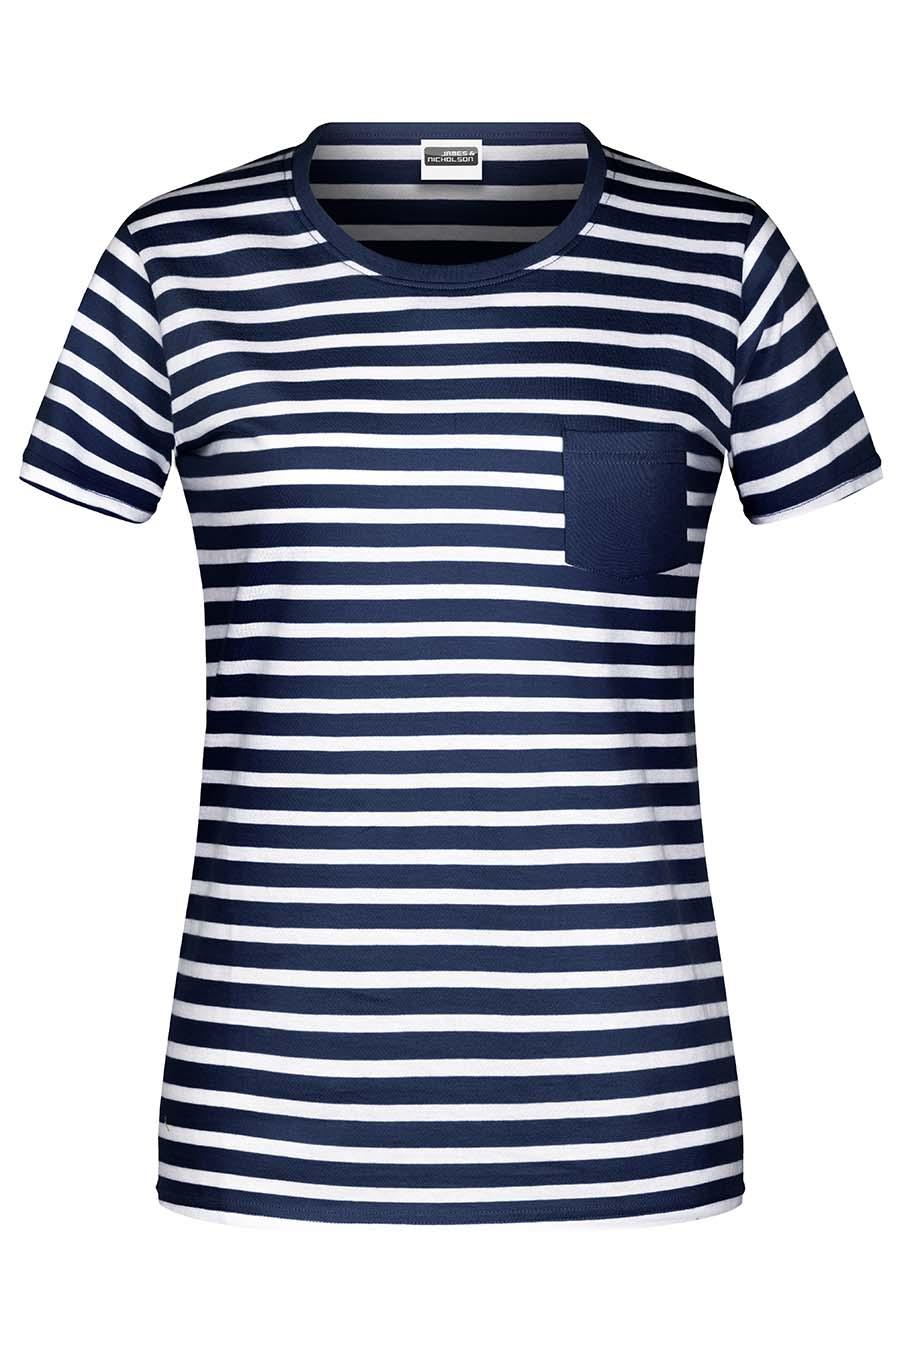 Tee-shirt bio rayé Femme - 20-1490-1